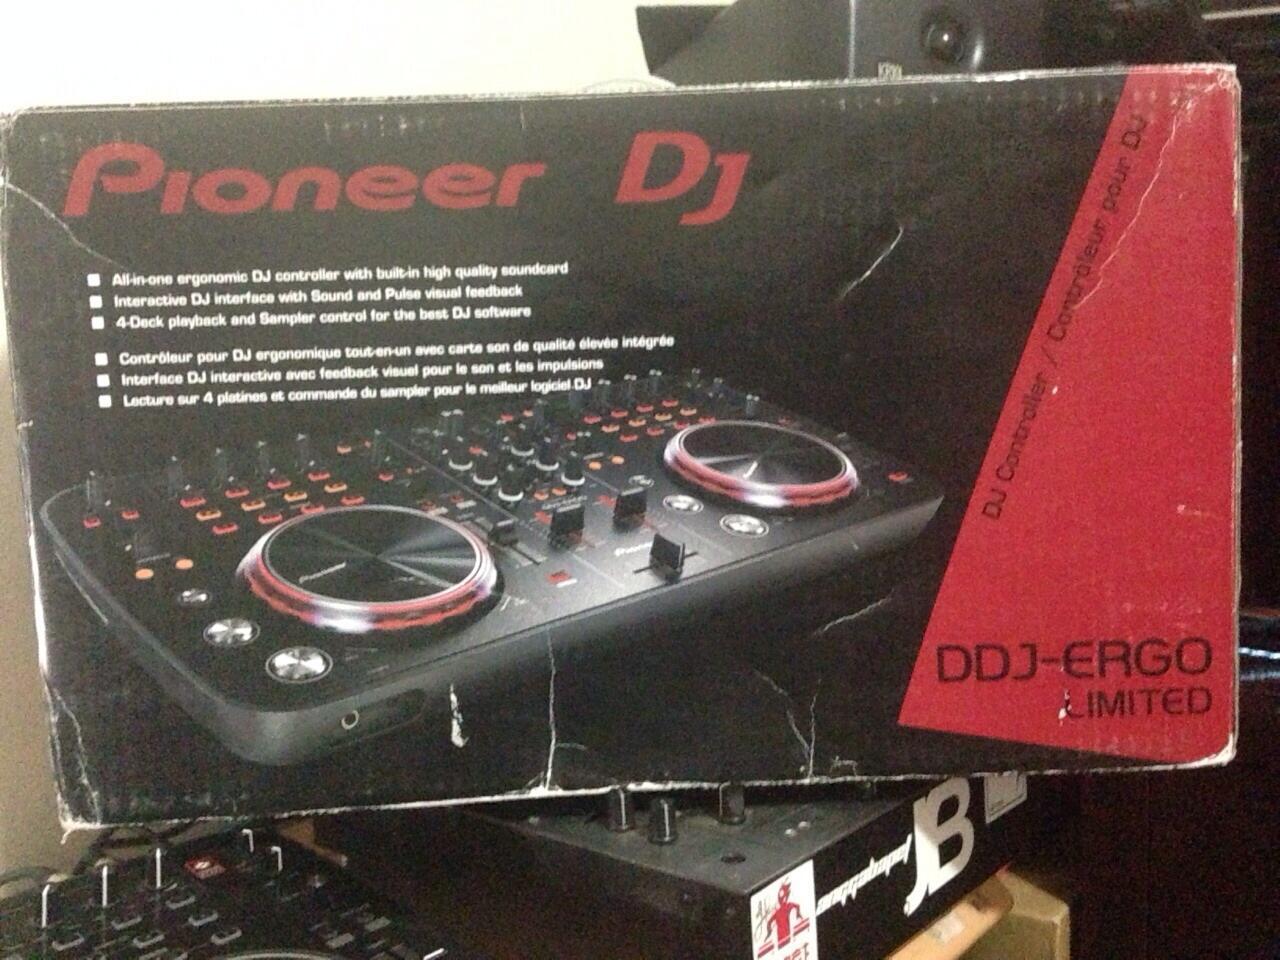 WTS II Pioneer DDJ Ergo-K , Pioneer Headphone HDJ 500-K , Soundcard NI Audio 4